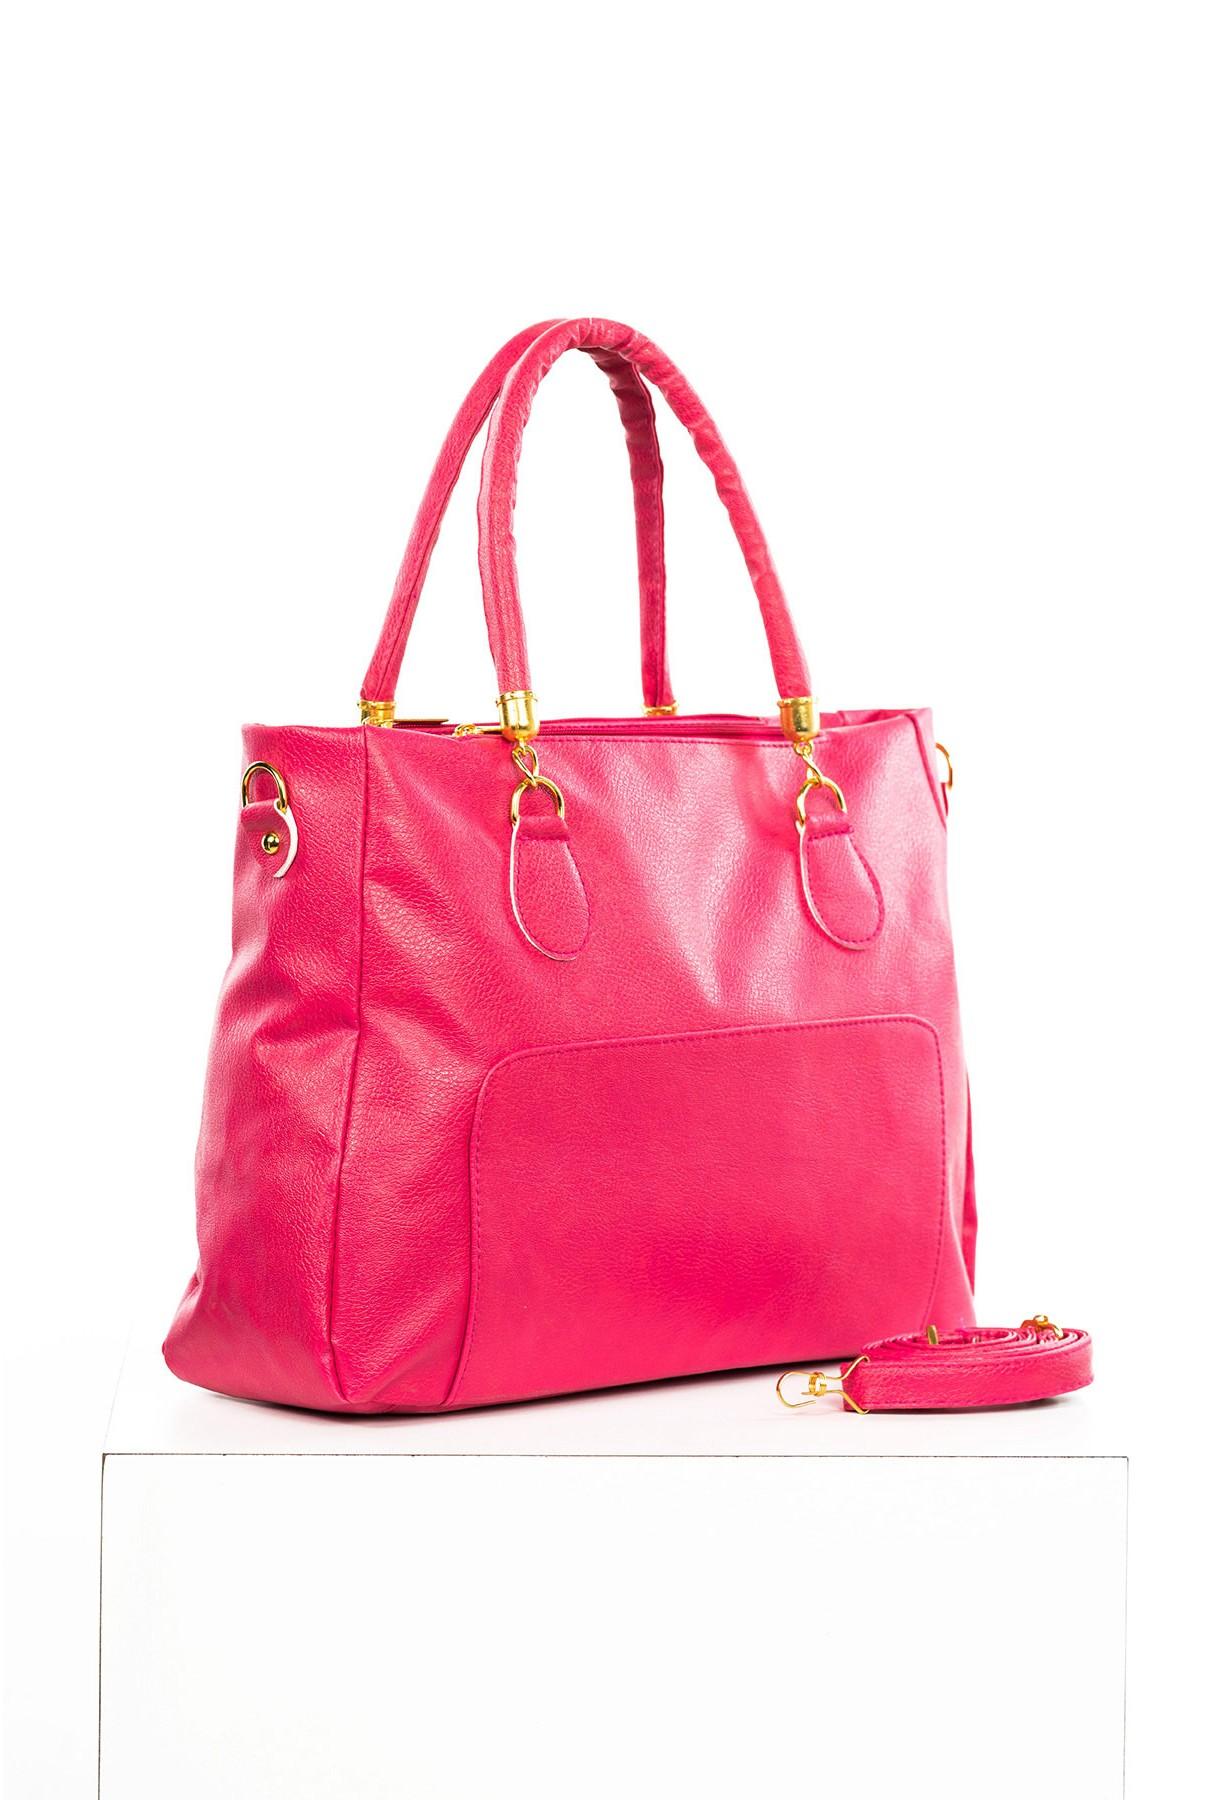 1799b0ef8124d بيع بالجملة - حقيبة يد نسائية   فوشيا - مانغولينو - mangolino ...